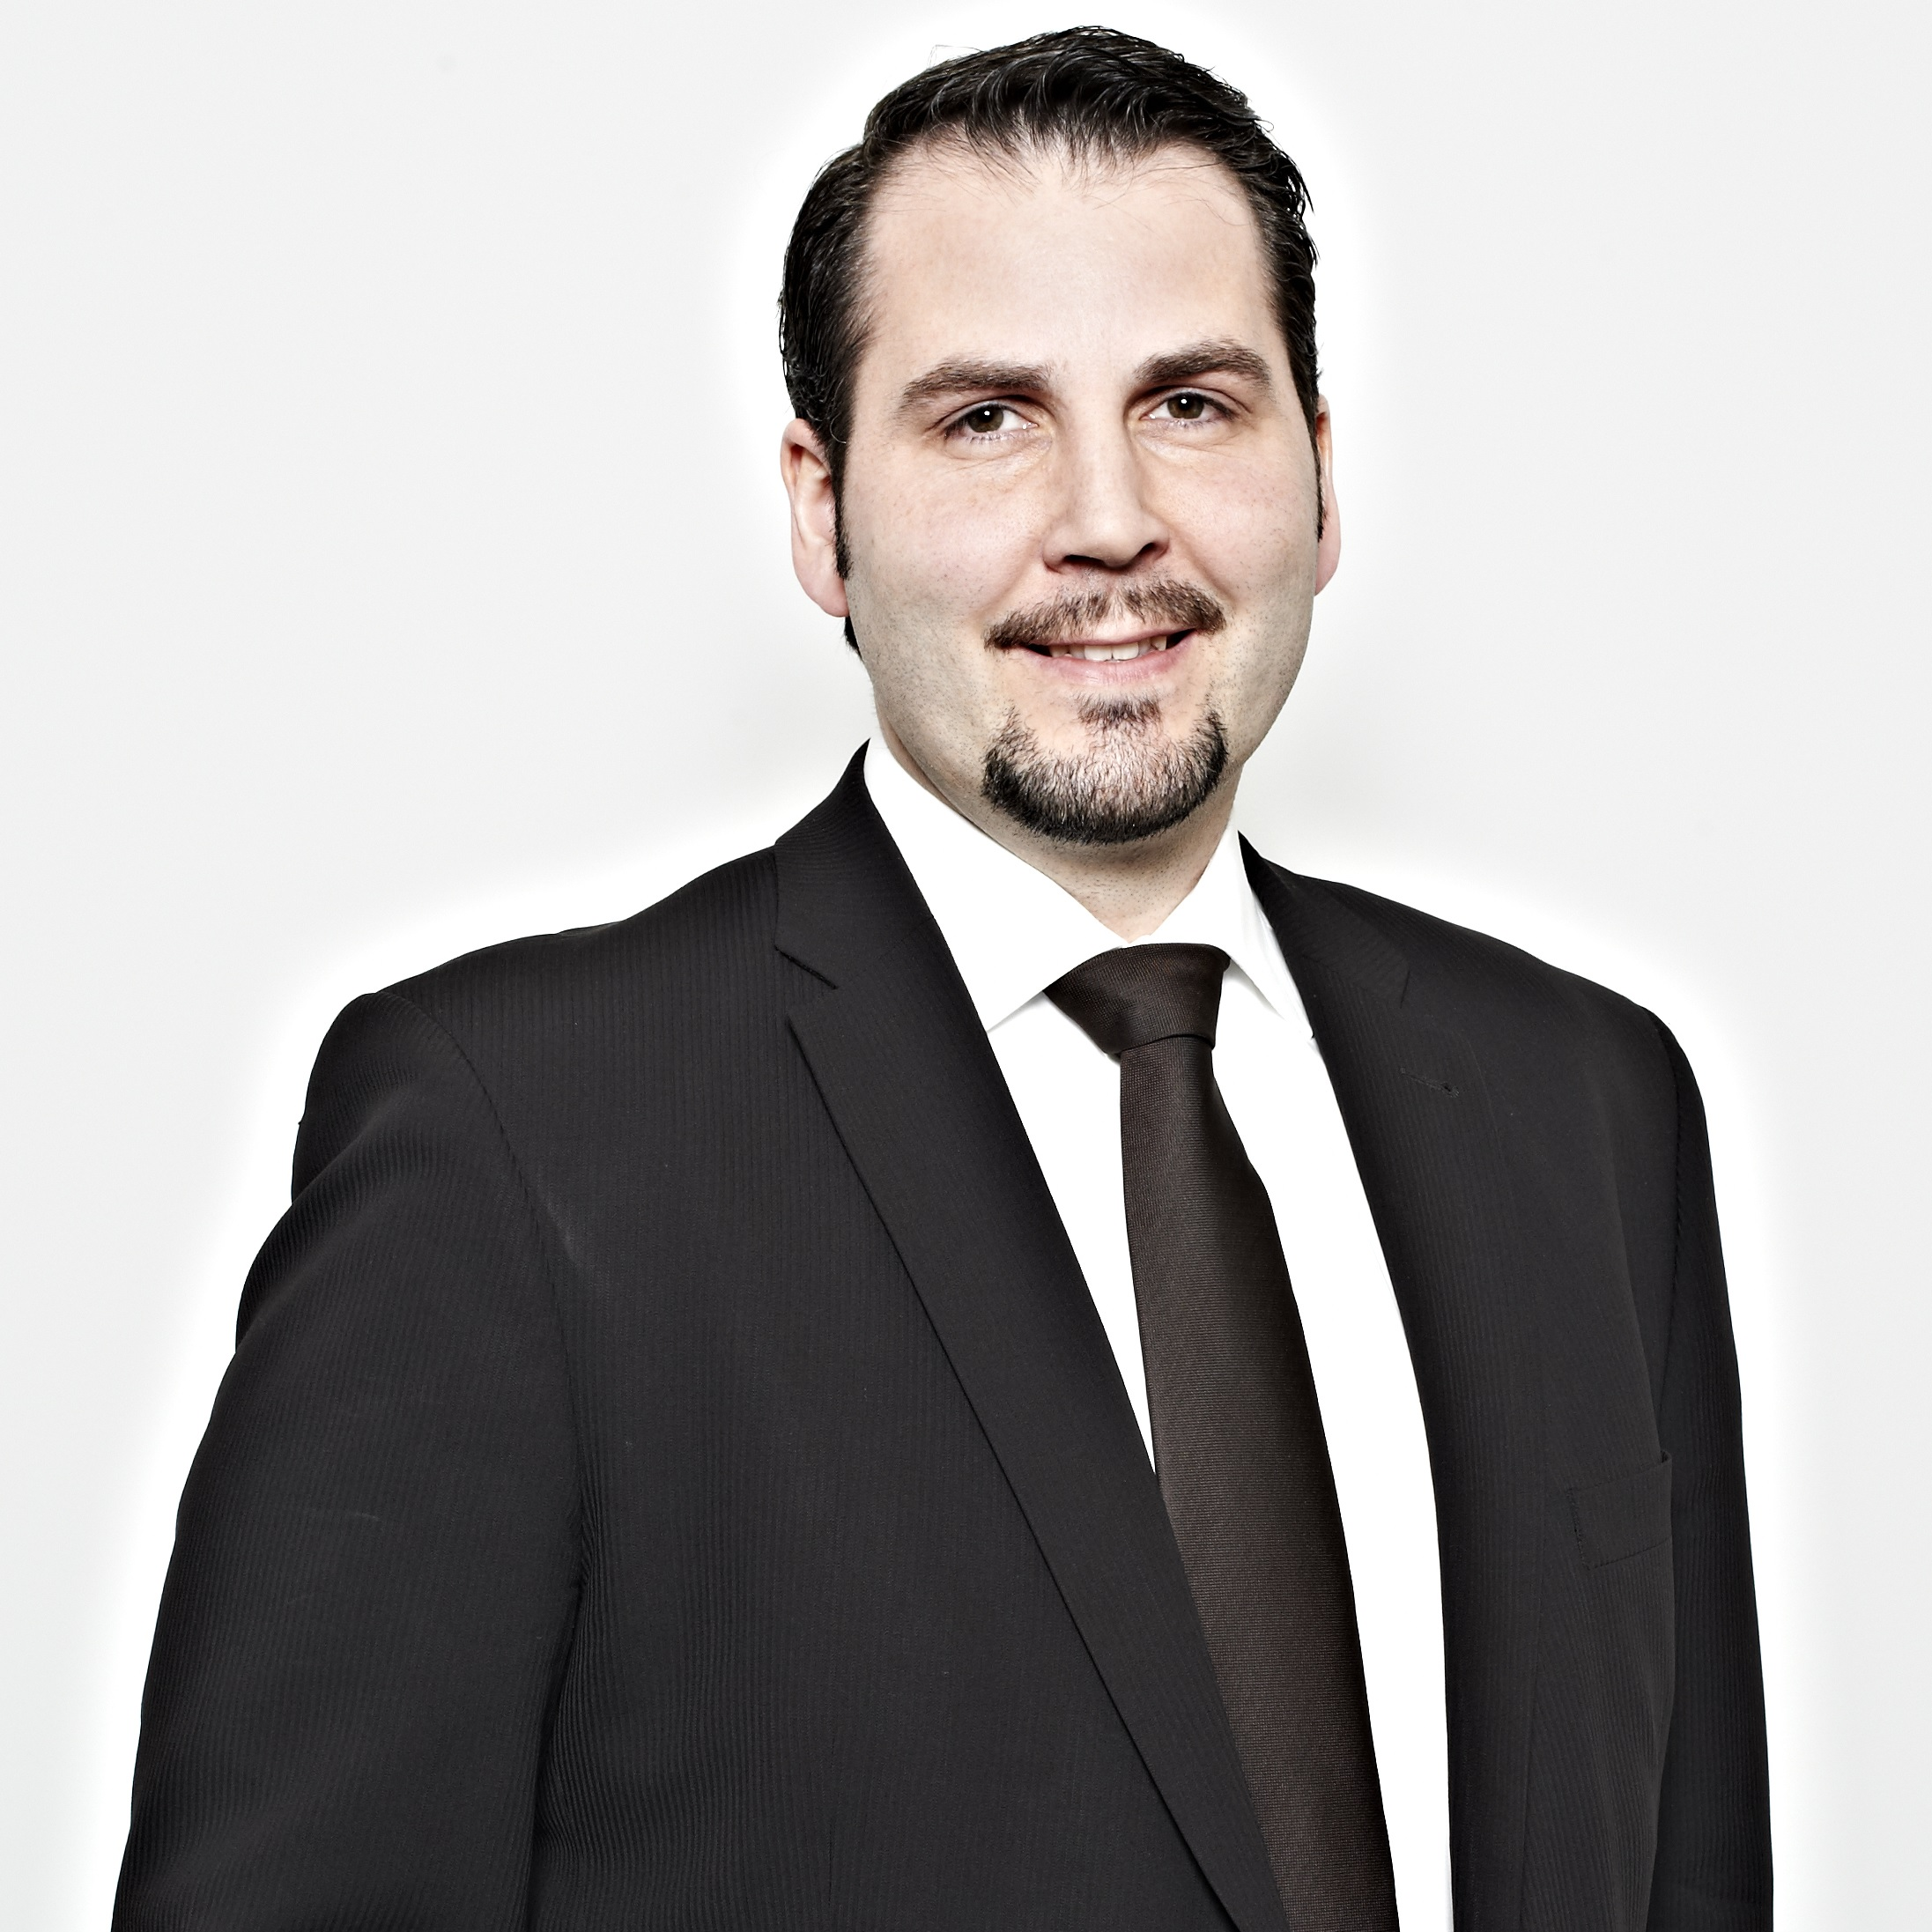 Dr. Matthias Postina